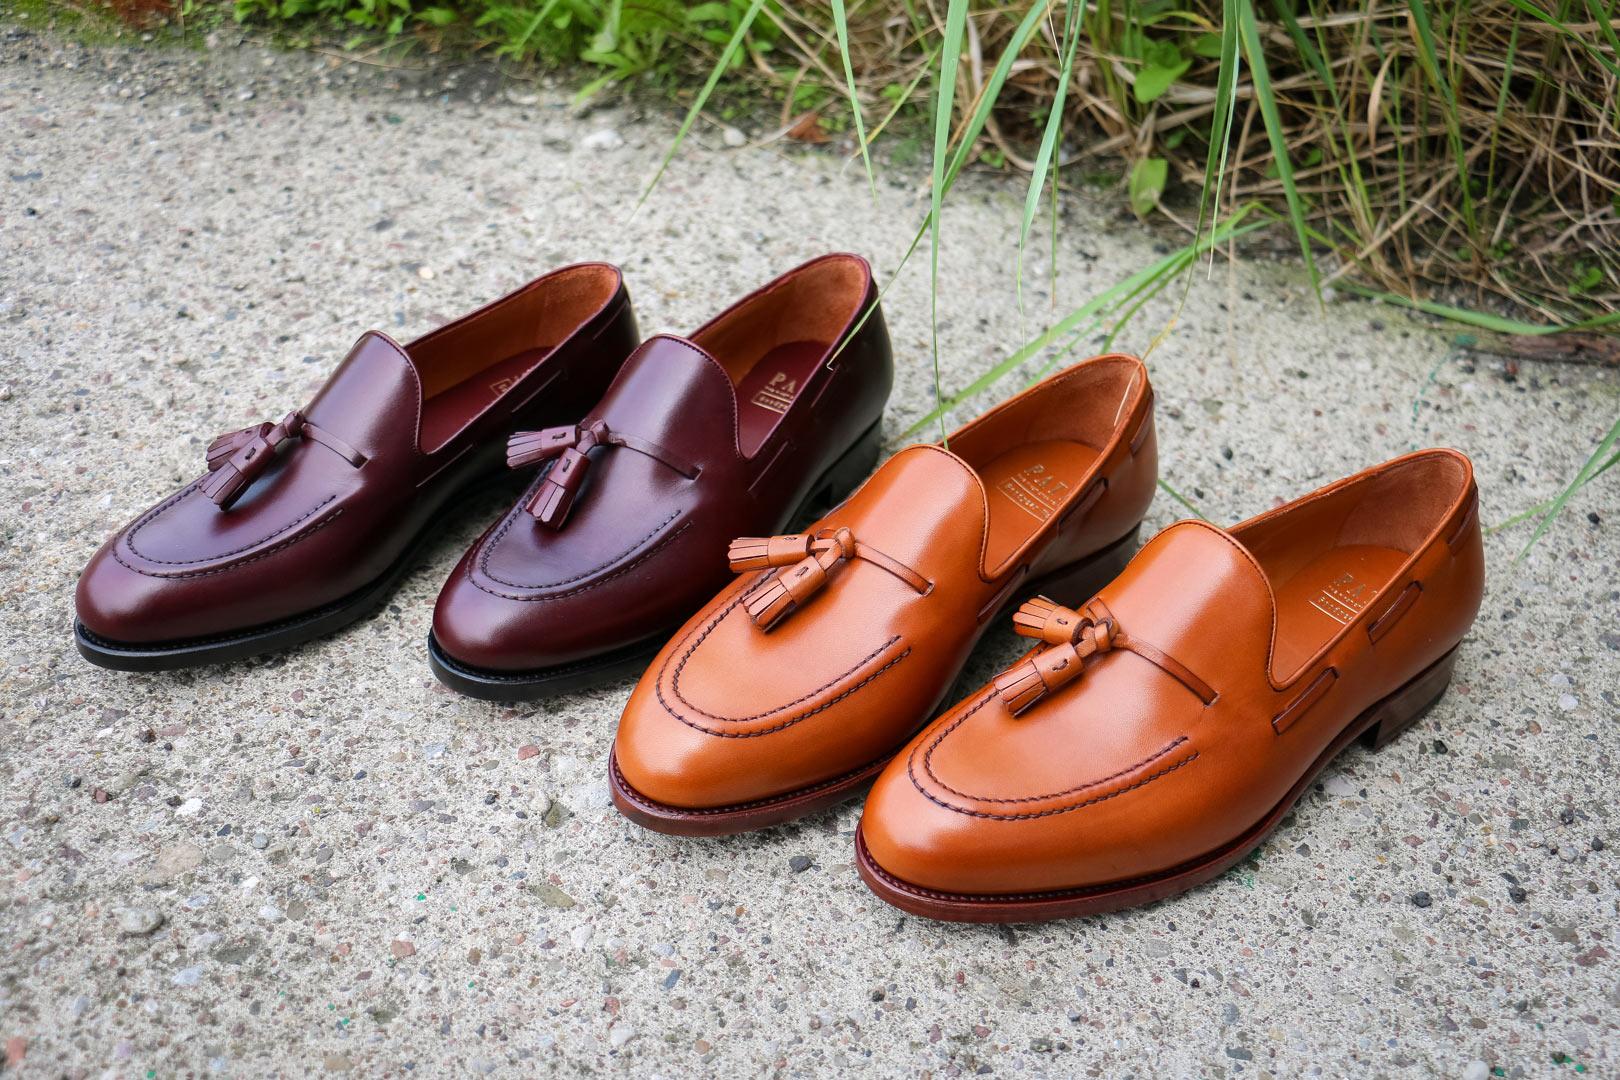 Tassel Loafers buty mokasyny dla gentlemana